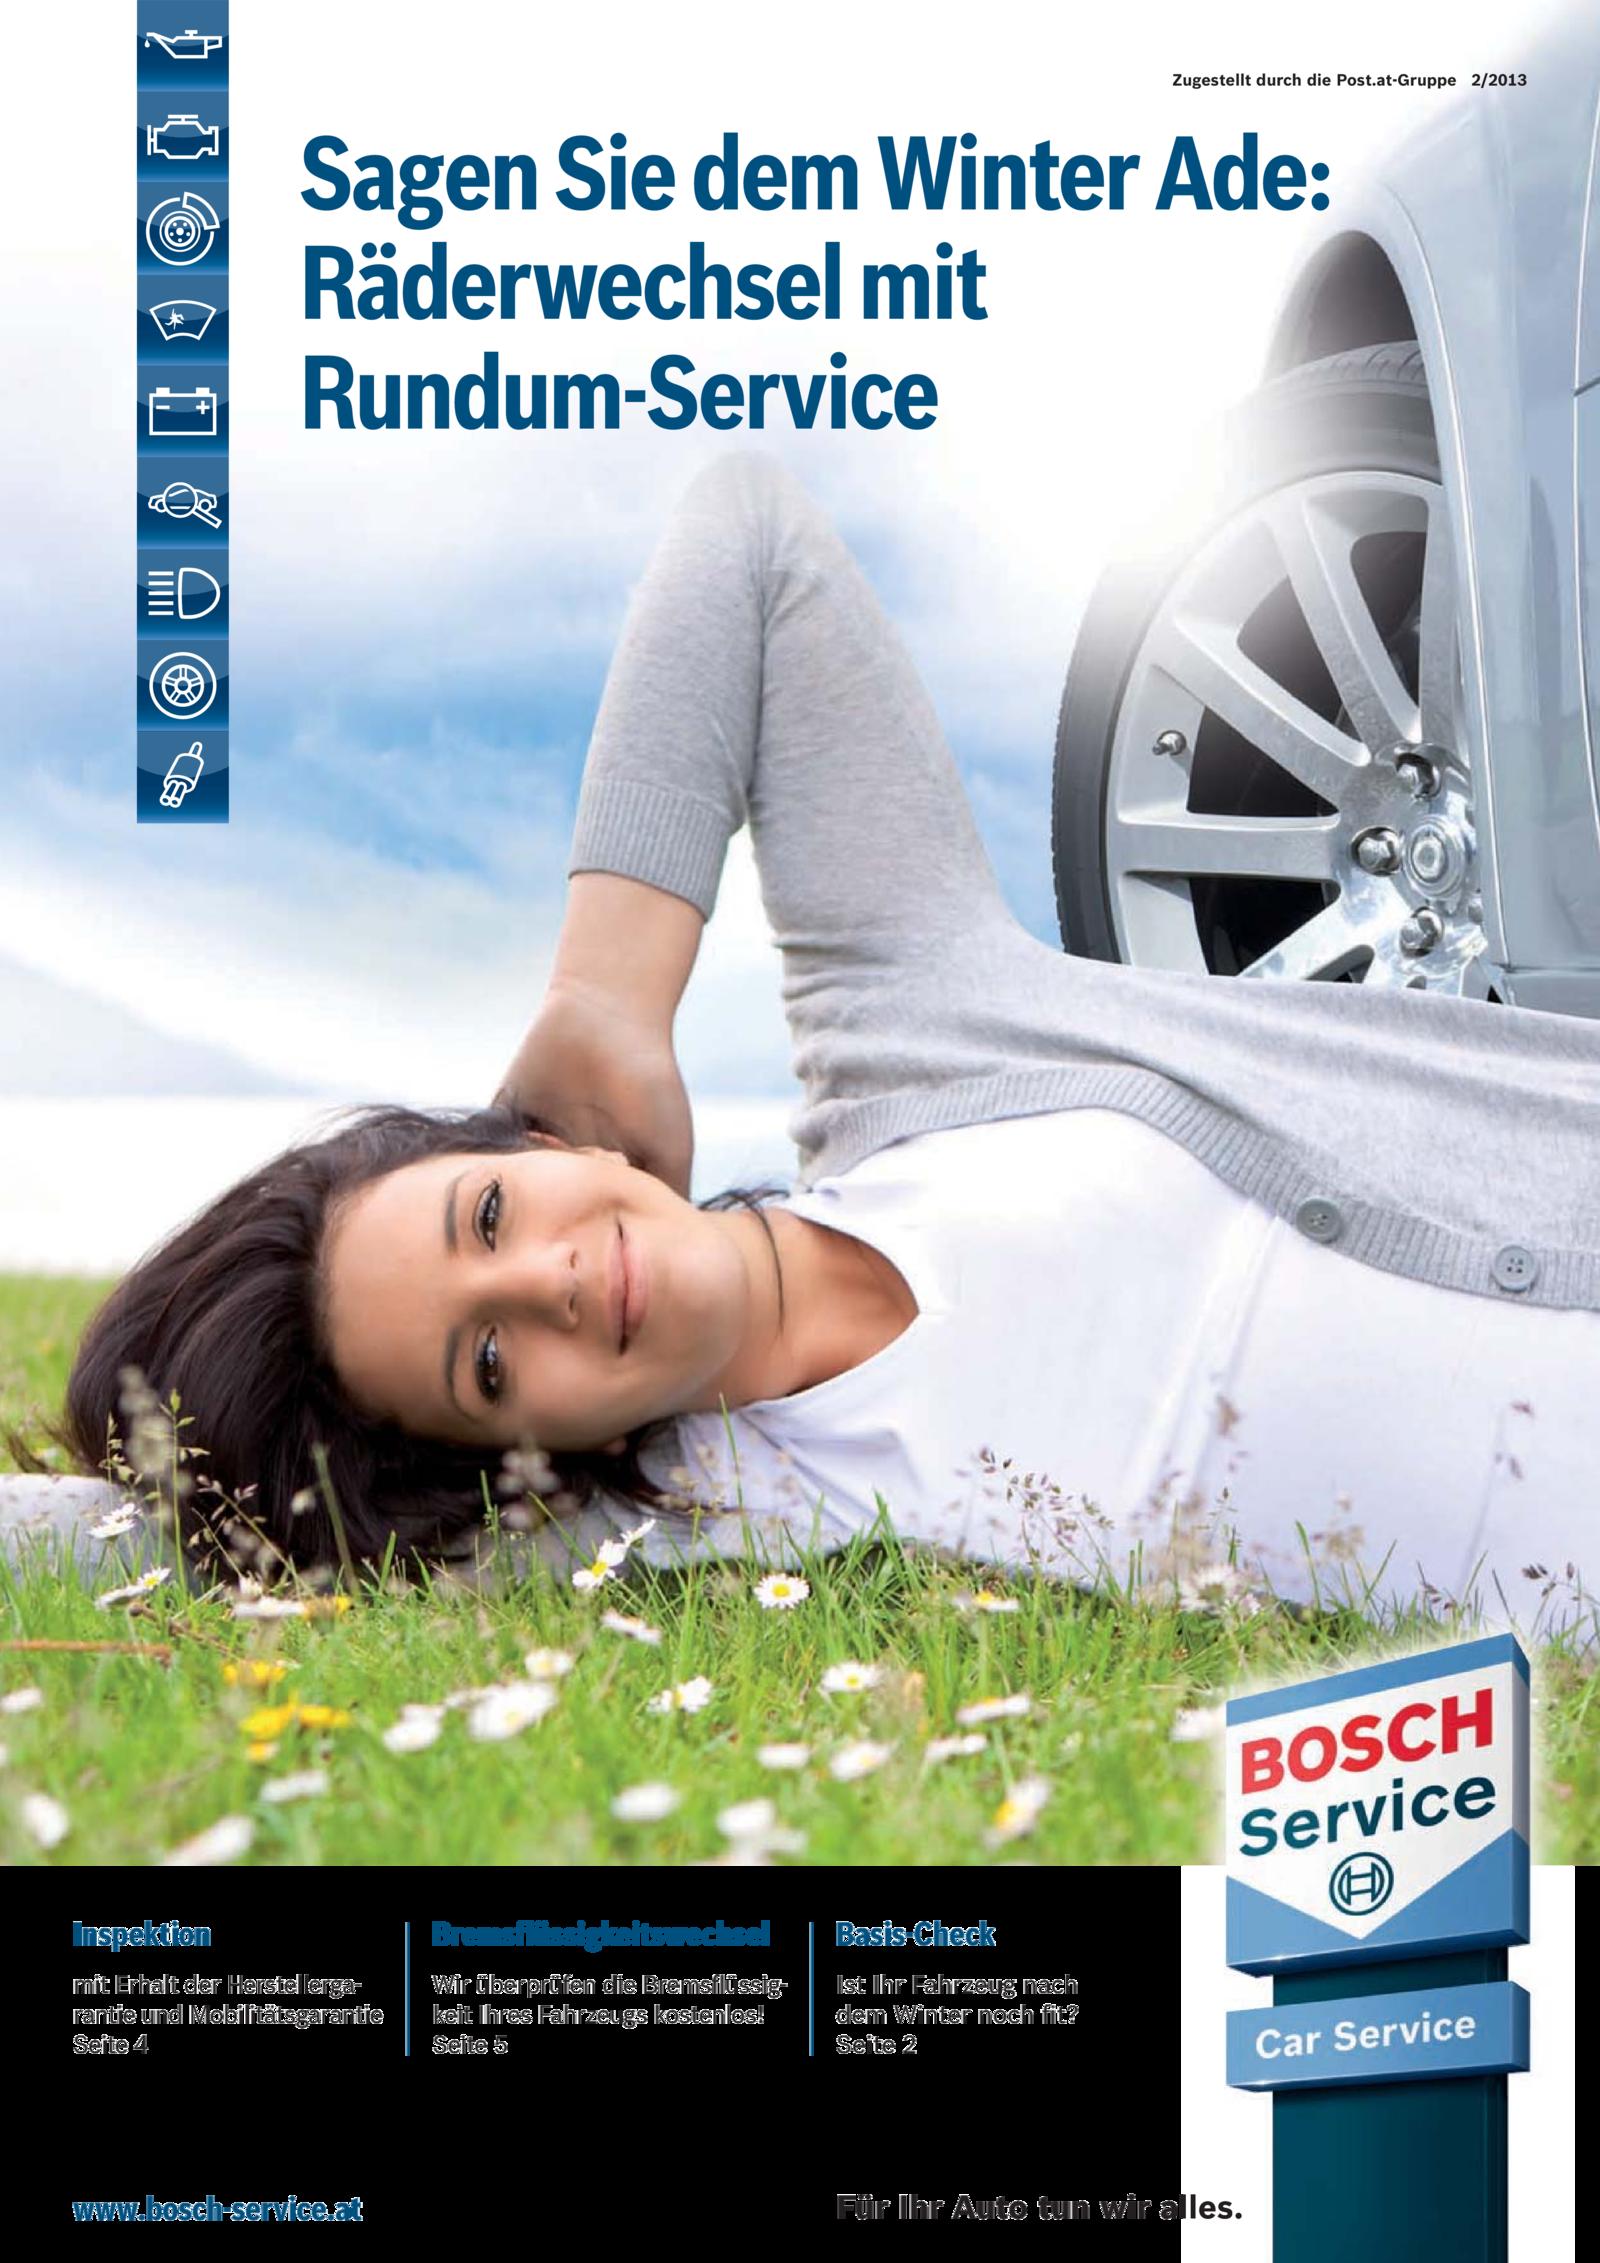 kfz zitta bosch car service truck service in linz kfz. Black Bedroom Furniture Sets. Home Design Ideas